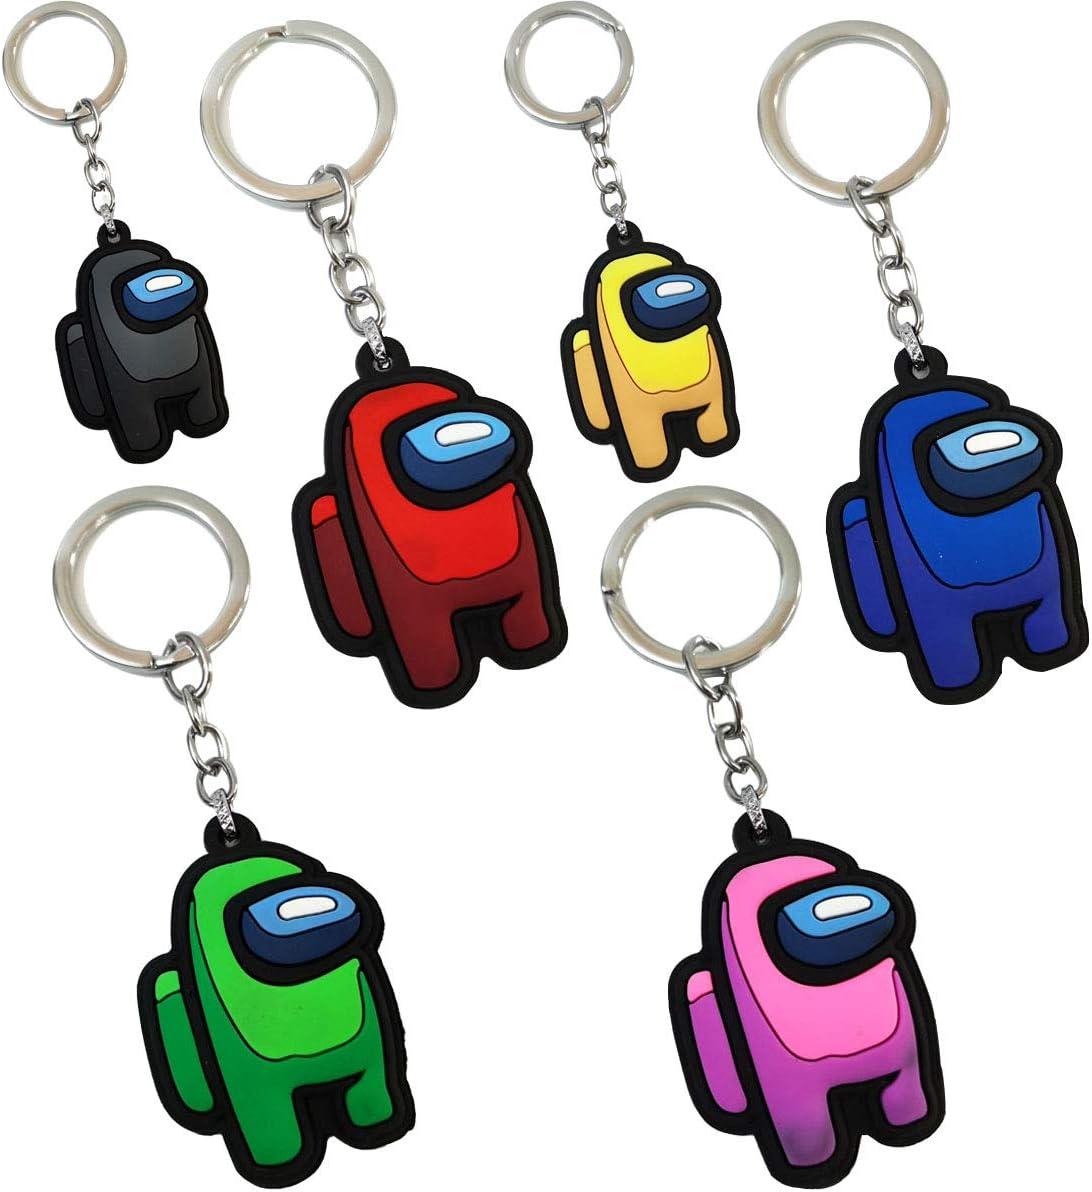 6 Pcs Amongg us Character Keychain,Cute Key rings Pendant Decor Christmas Gifts Christmas Tree Decor Pack